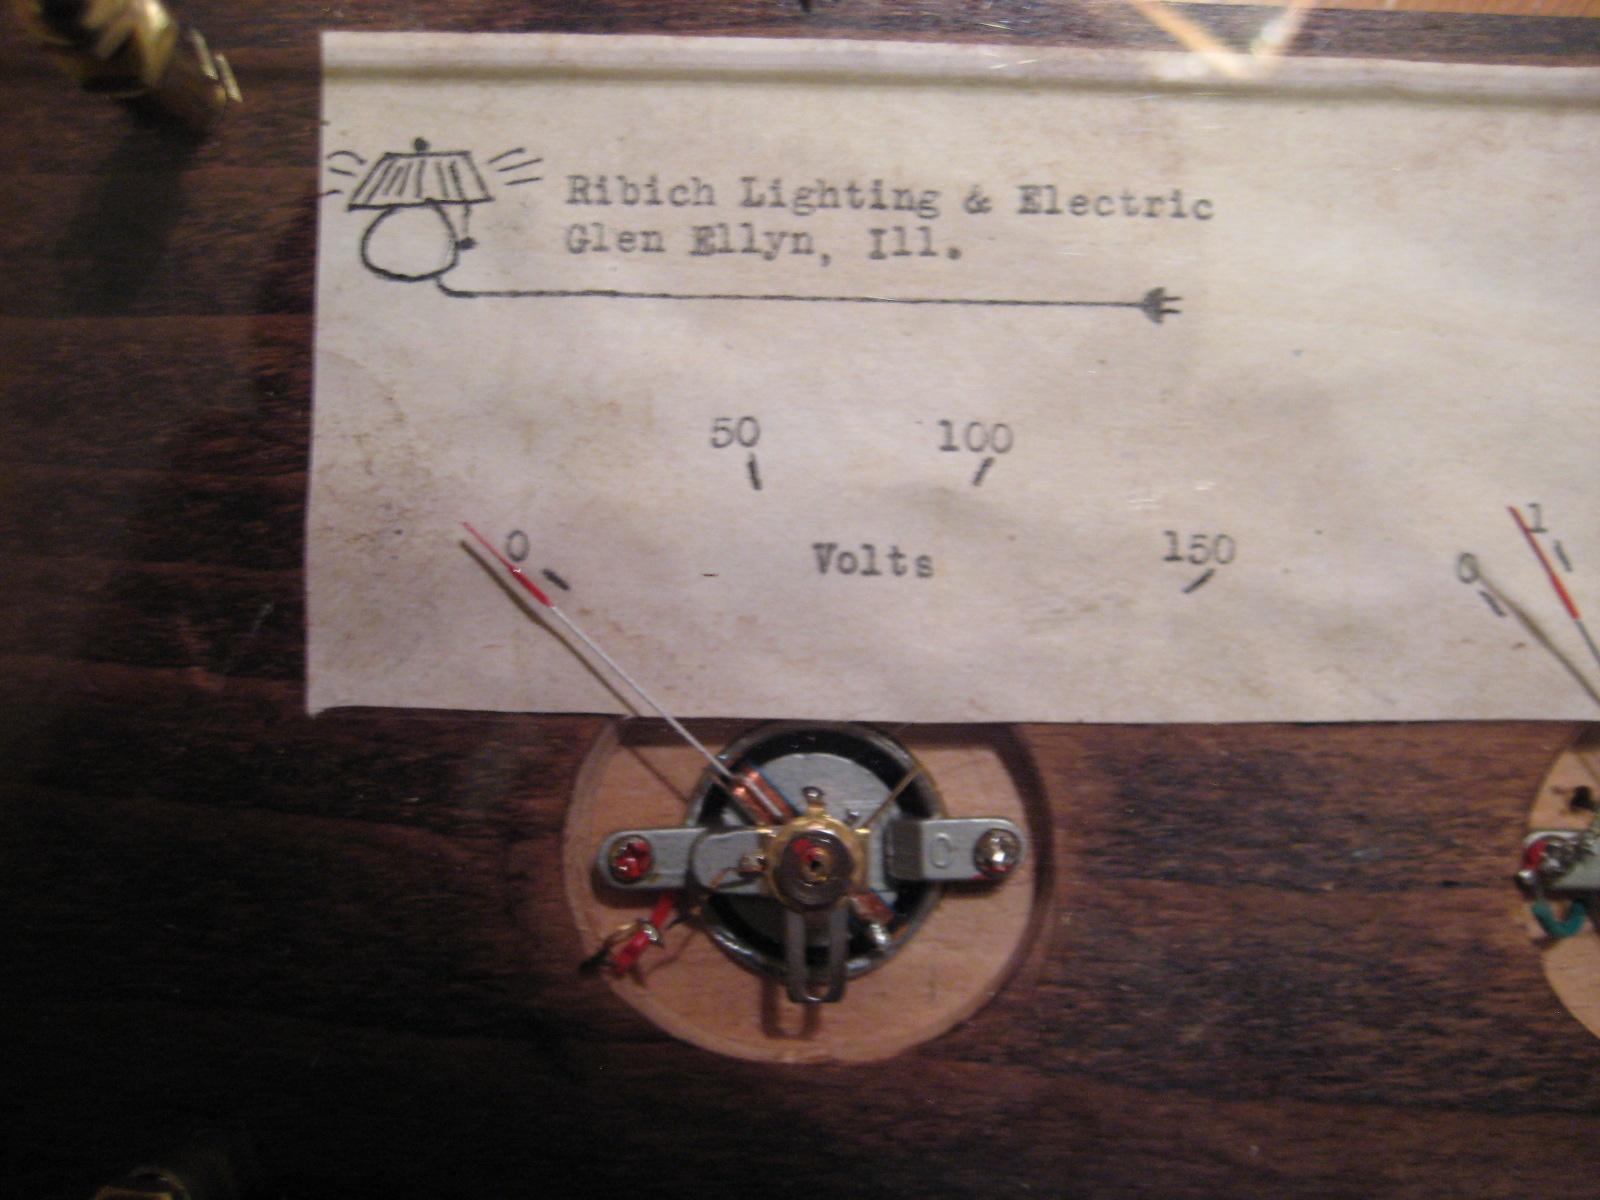 Build an Analog Electricity Usage Meter